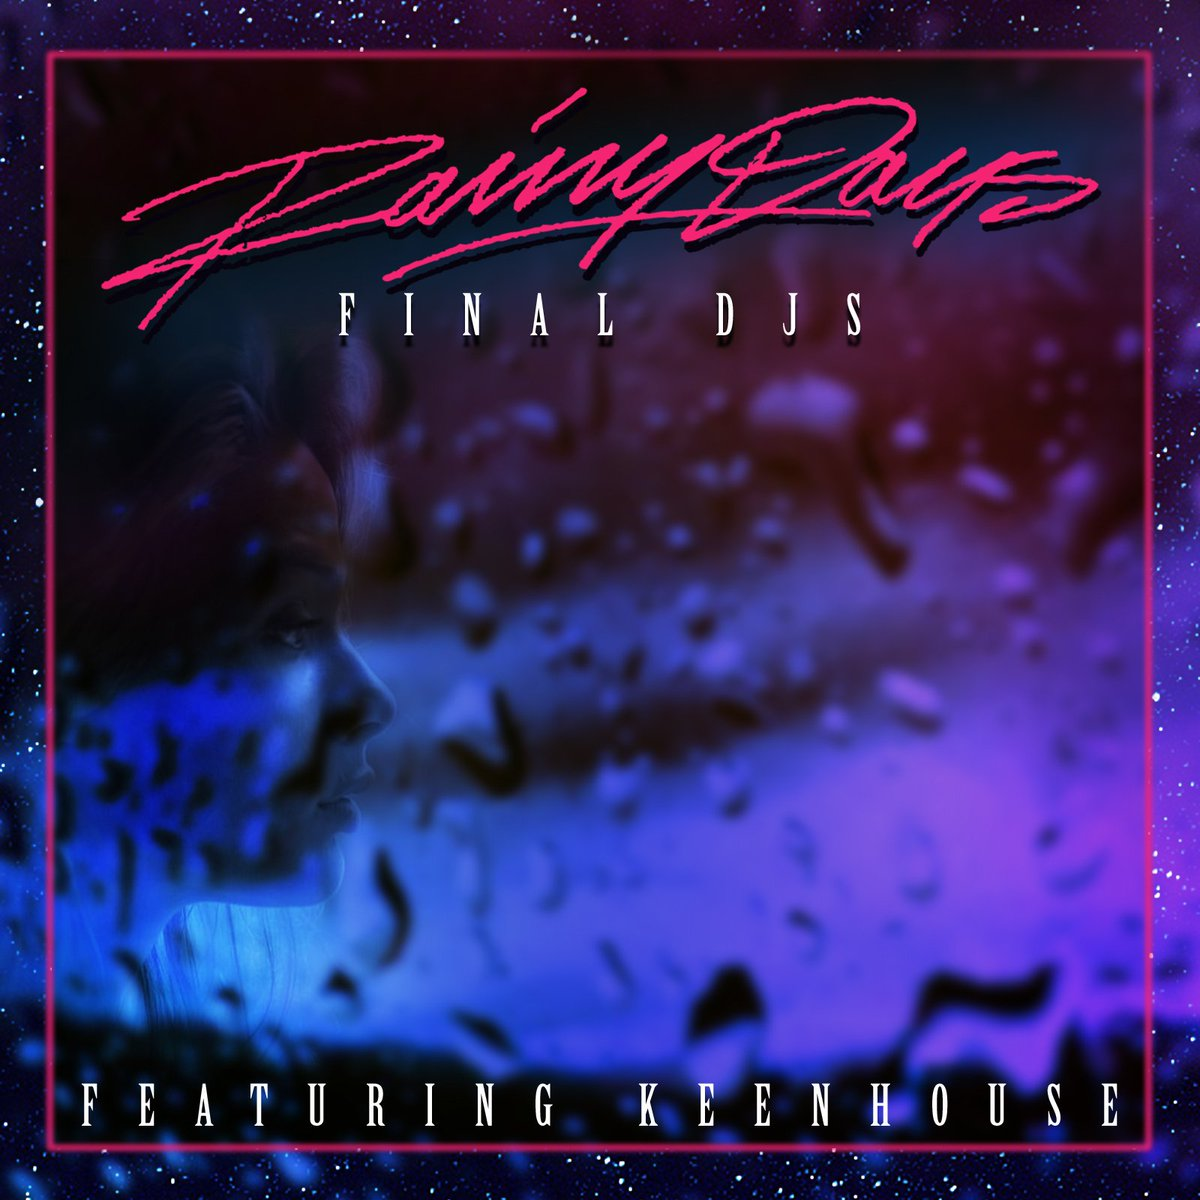 final-djs-keenhouse